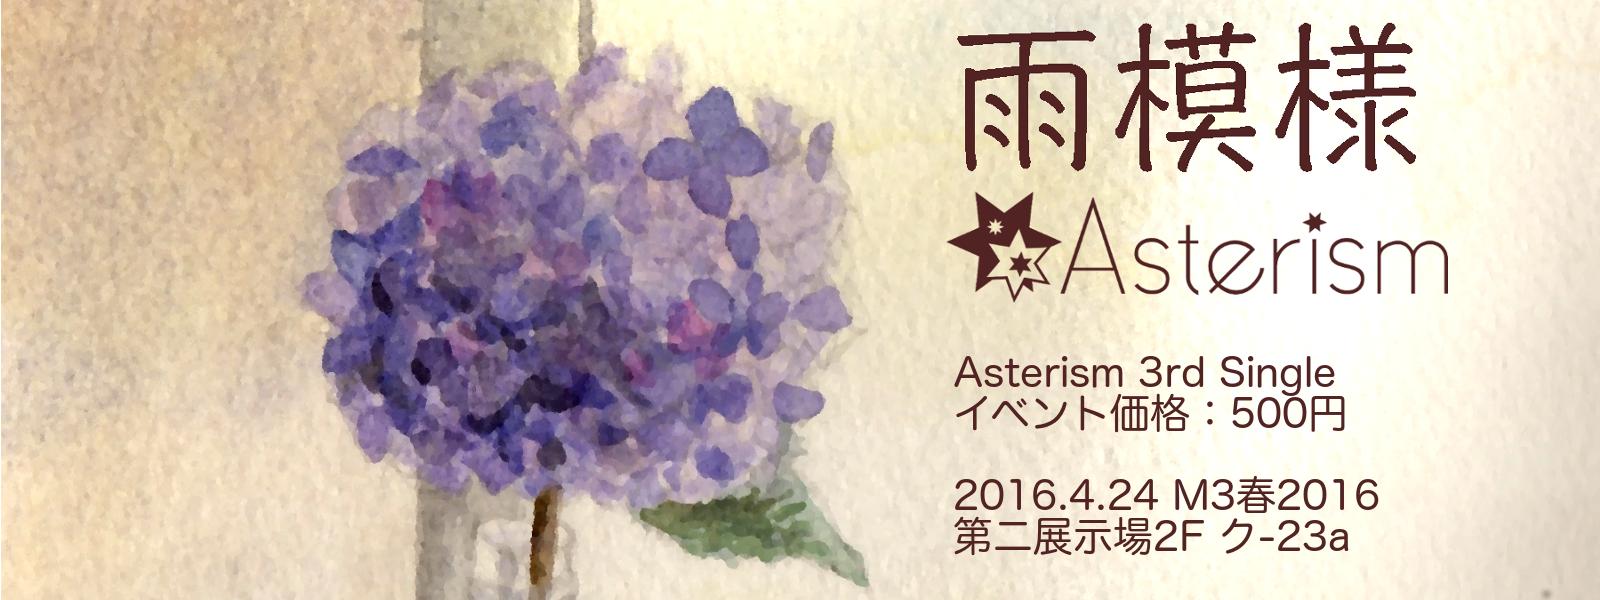 "Asterism 3rd Single ""雨模様"""